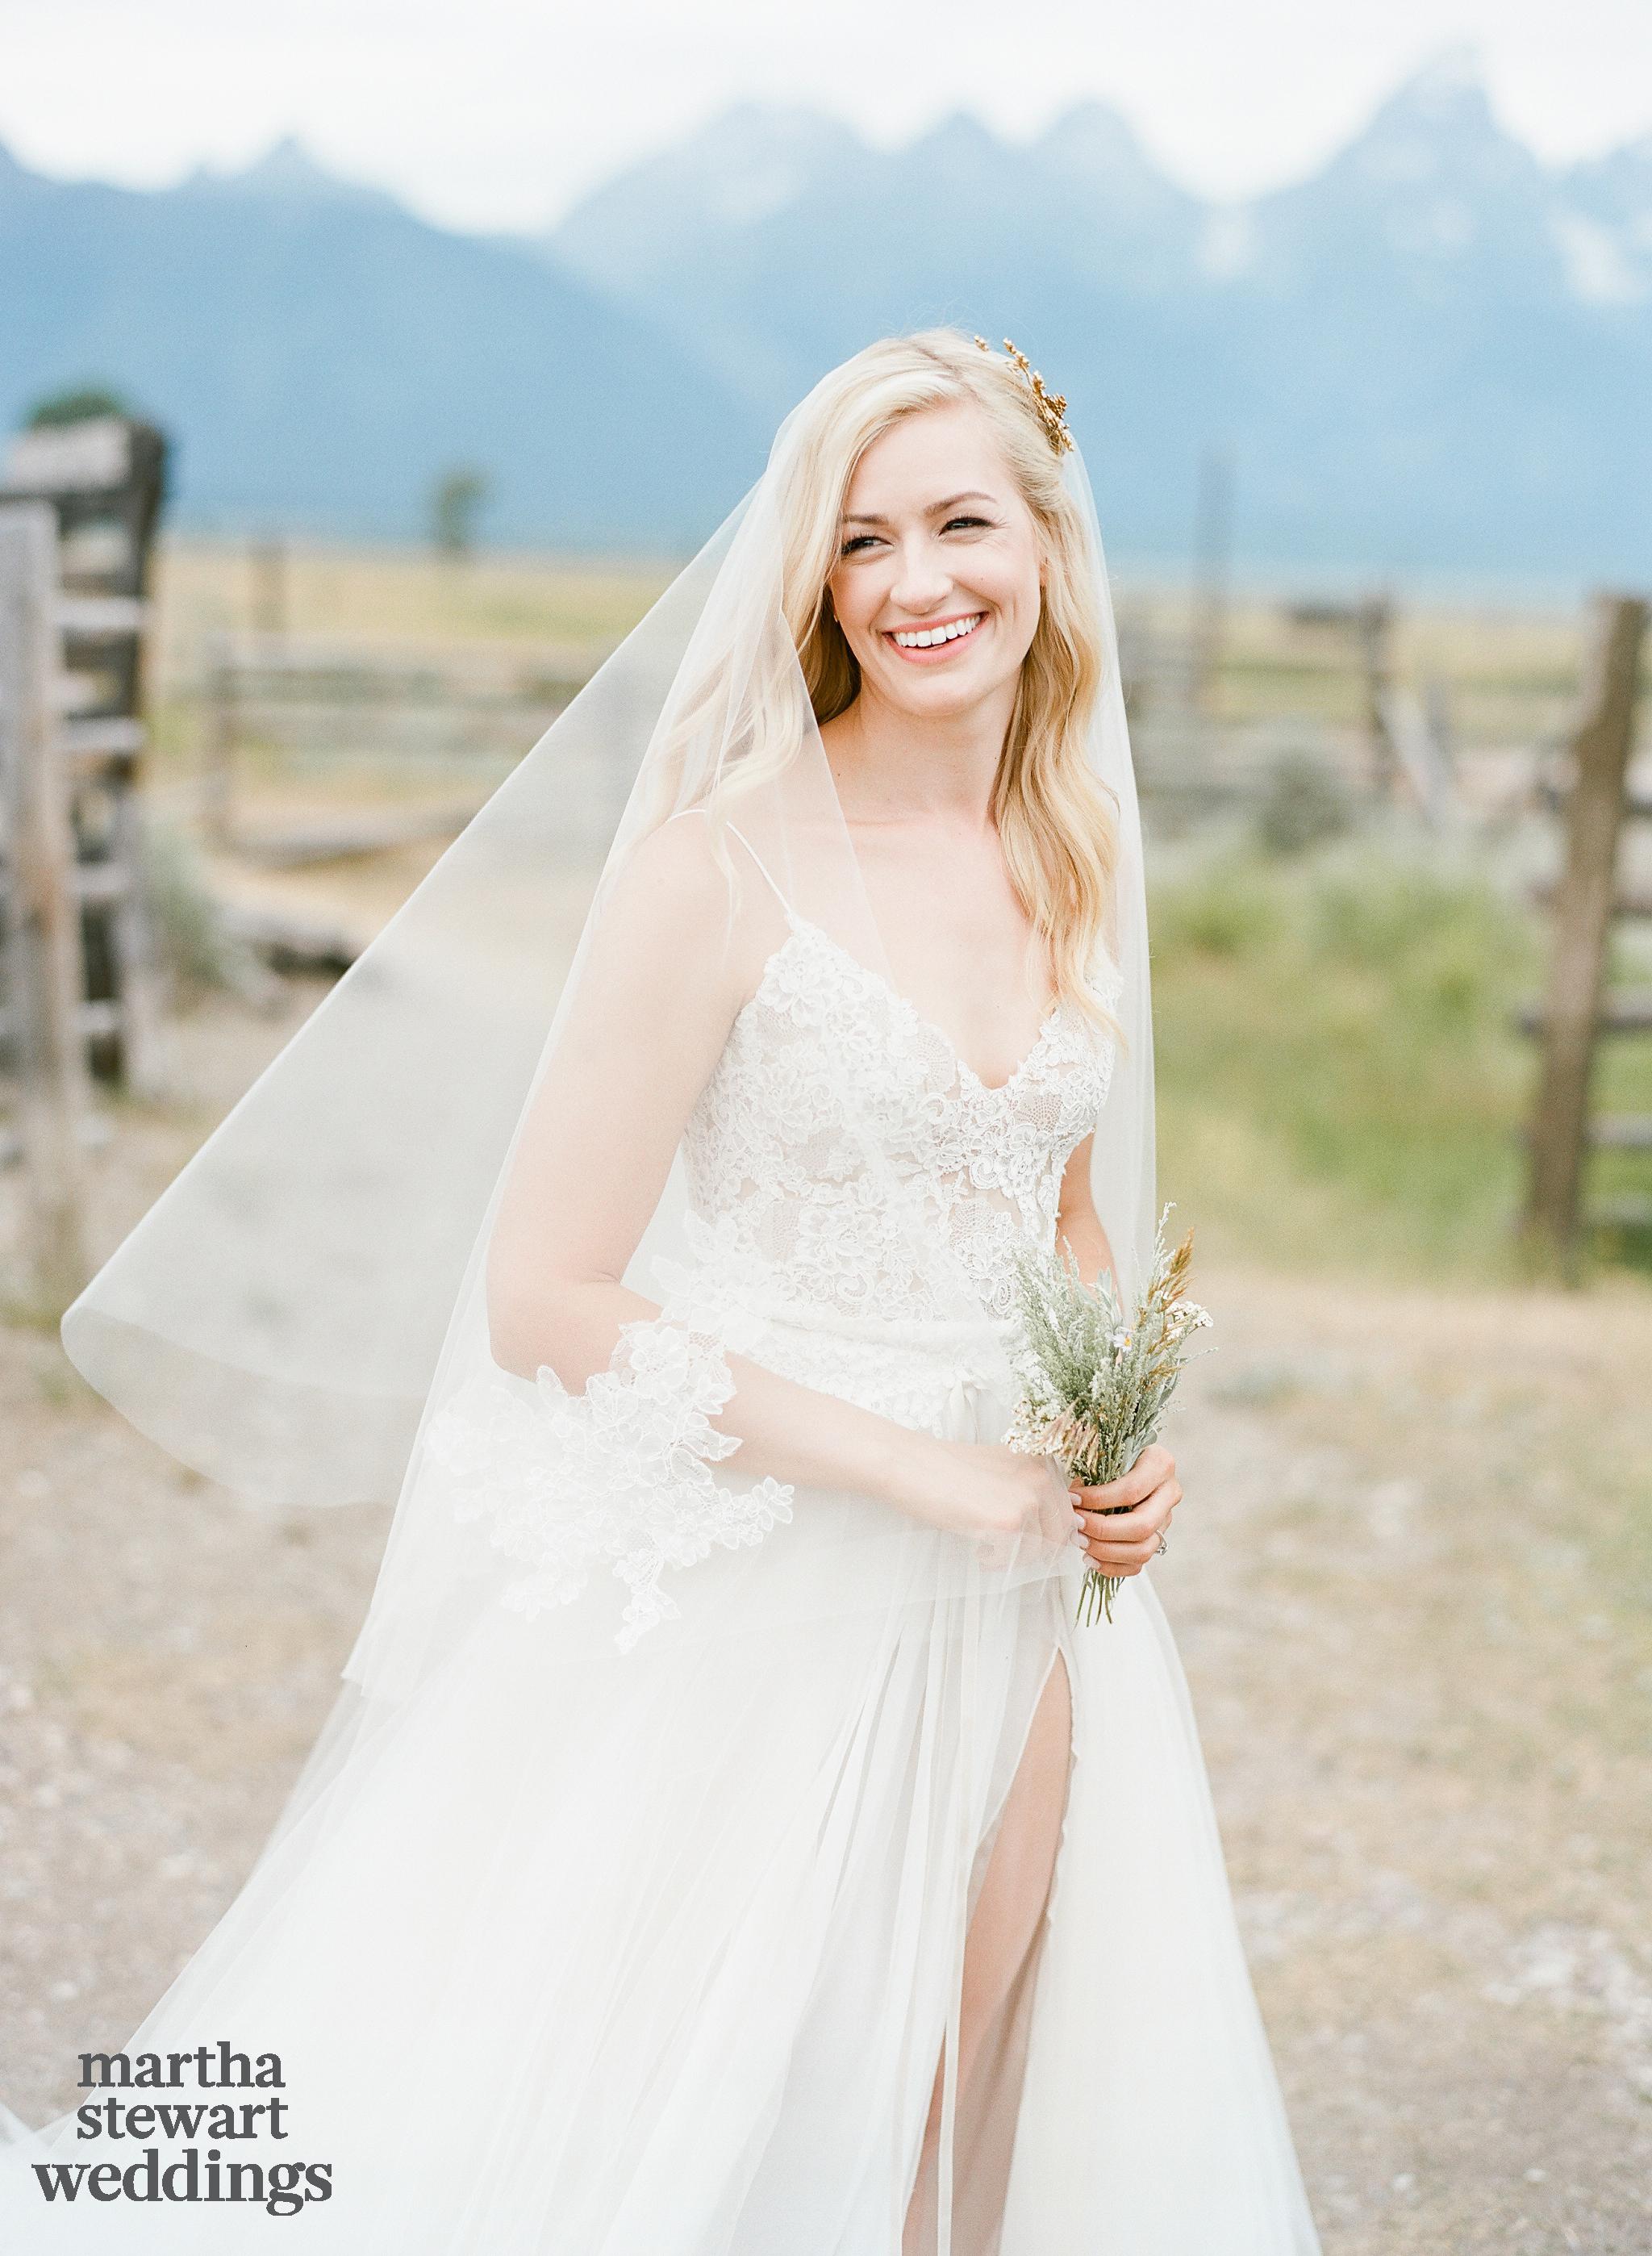 beth behrs michael gladis wedding bride bouquet sylvie gil